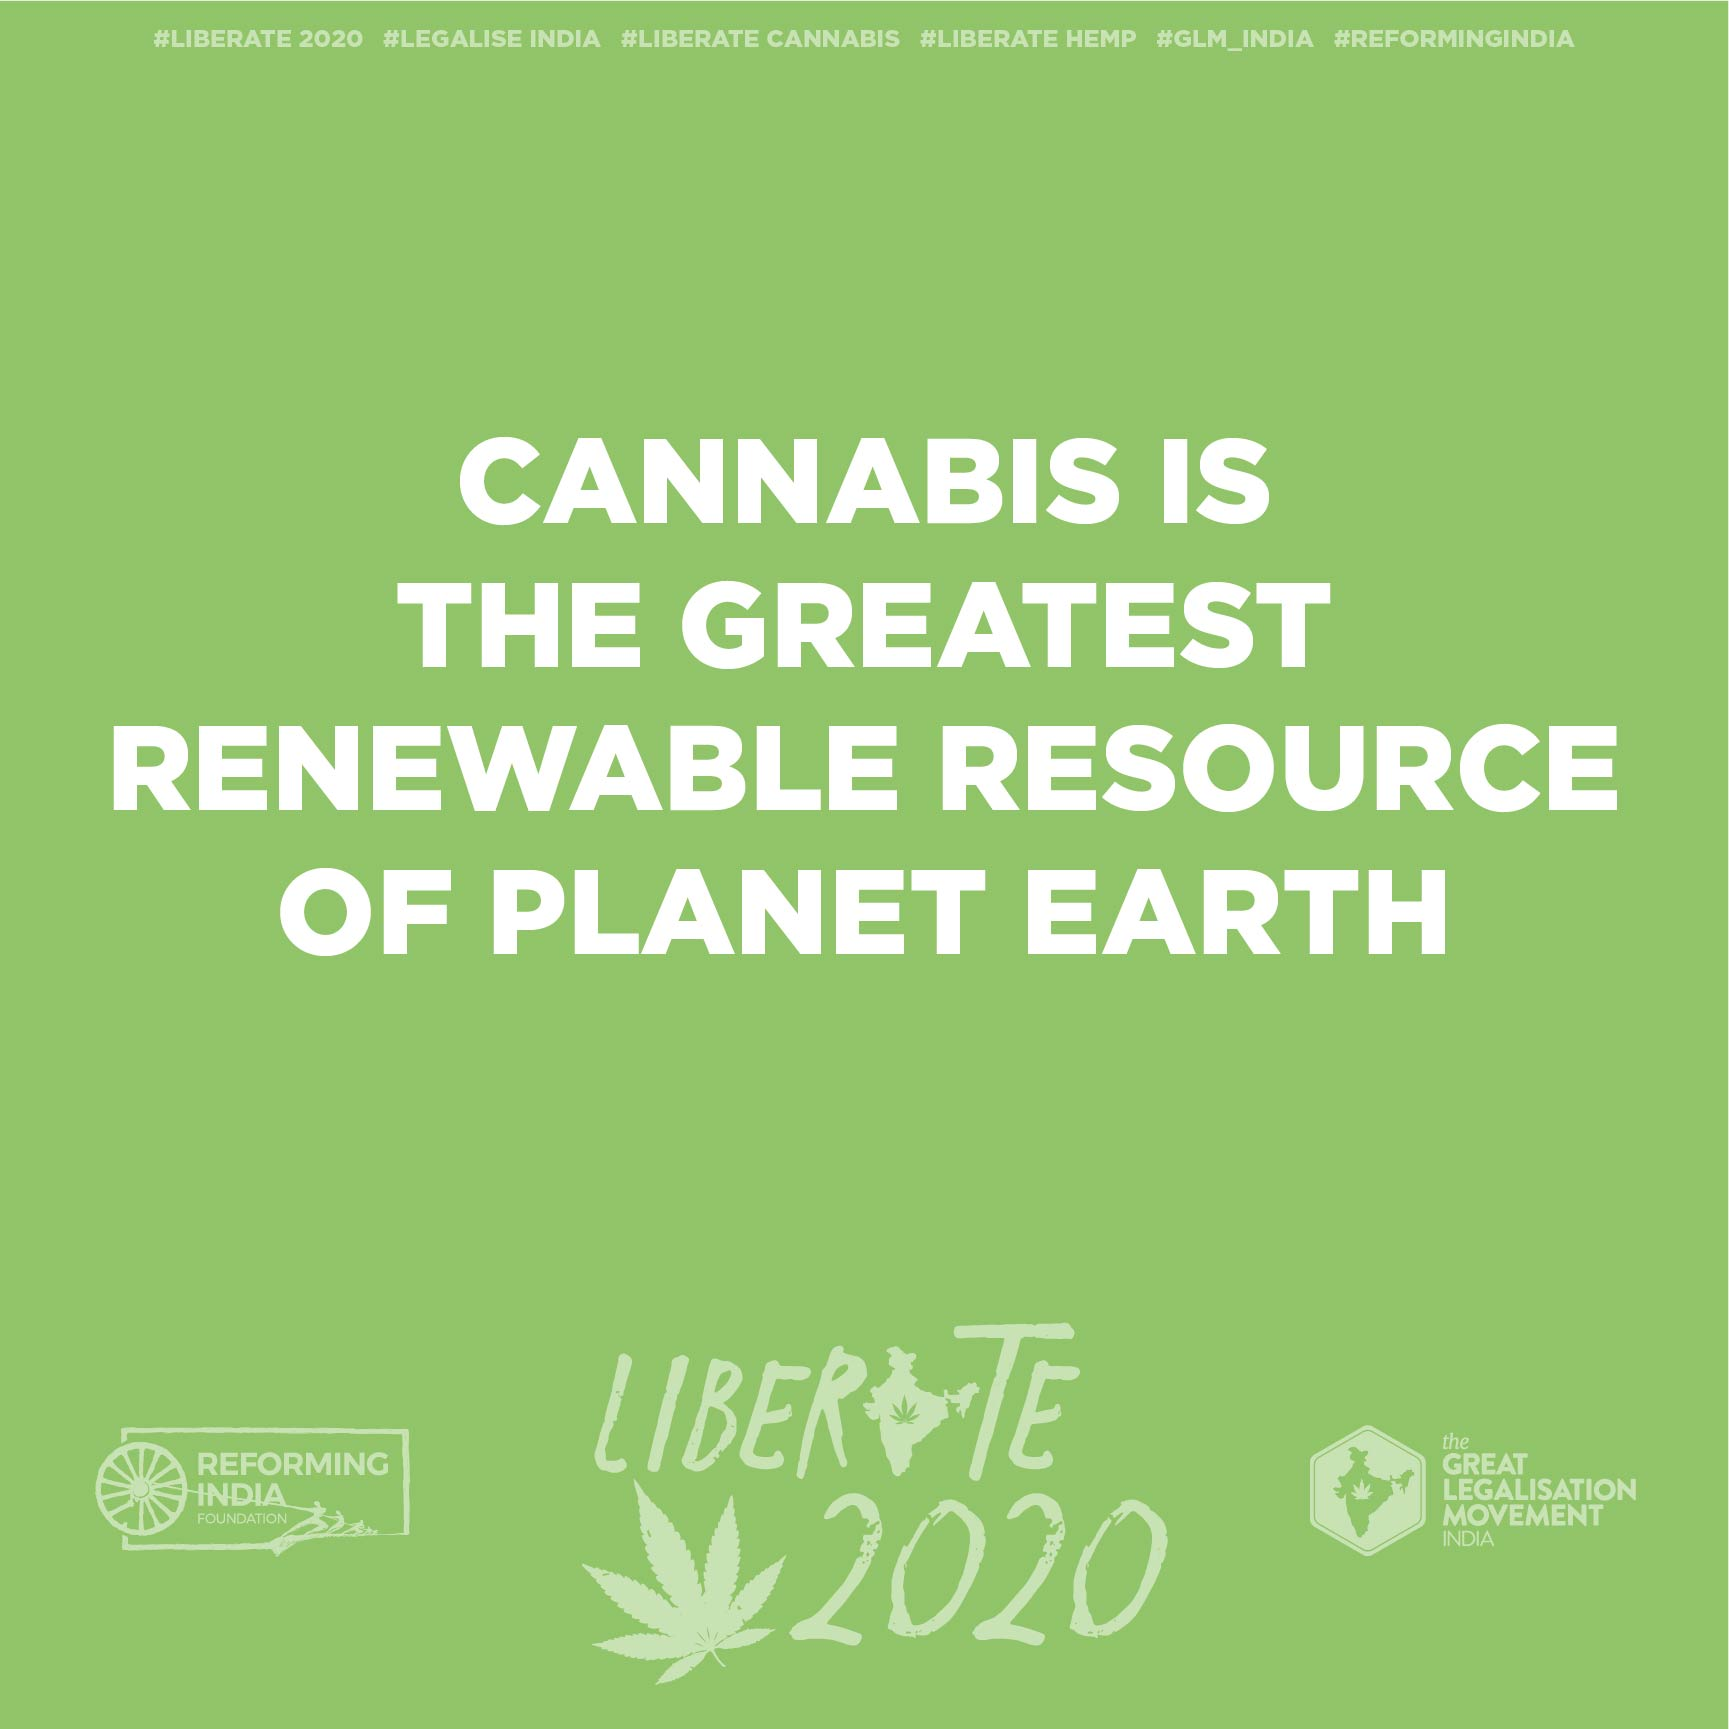 cannabisArtboard 1 copy 2-50.jpg